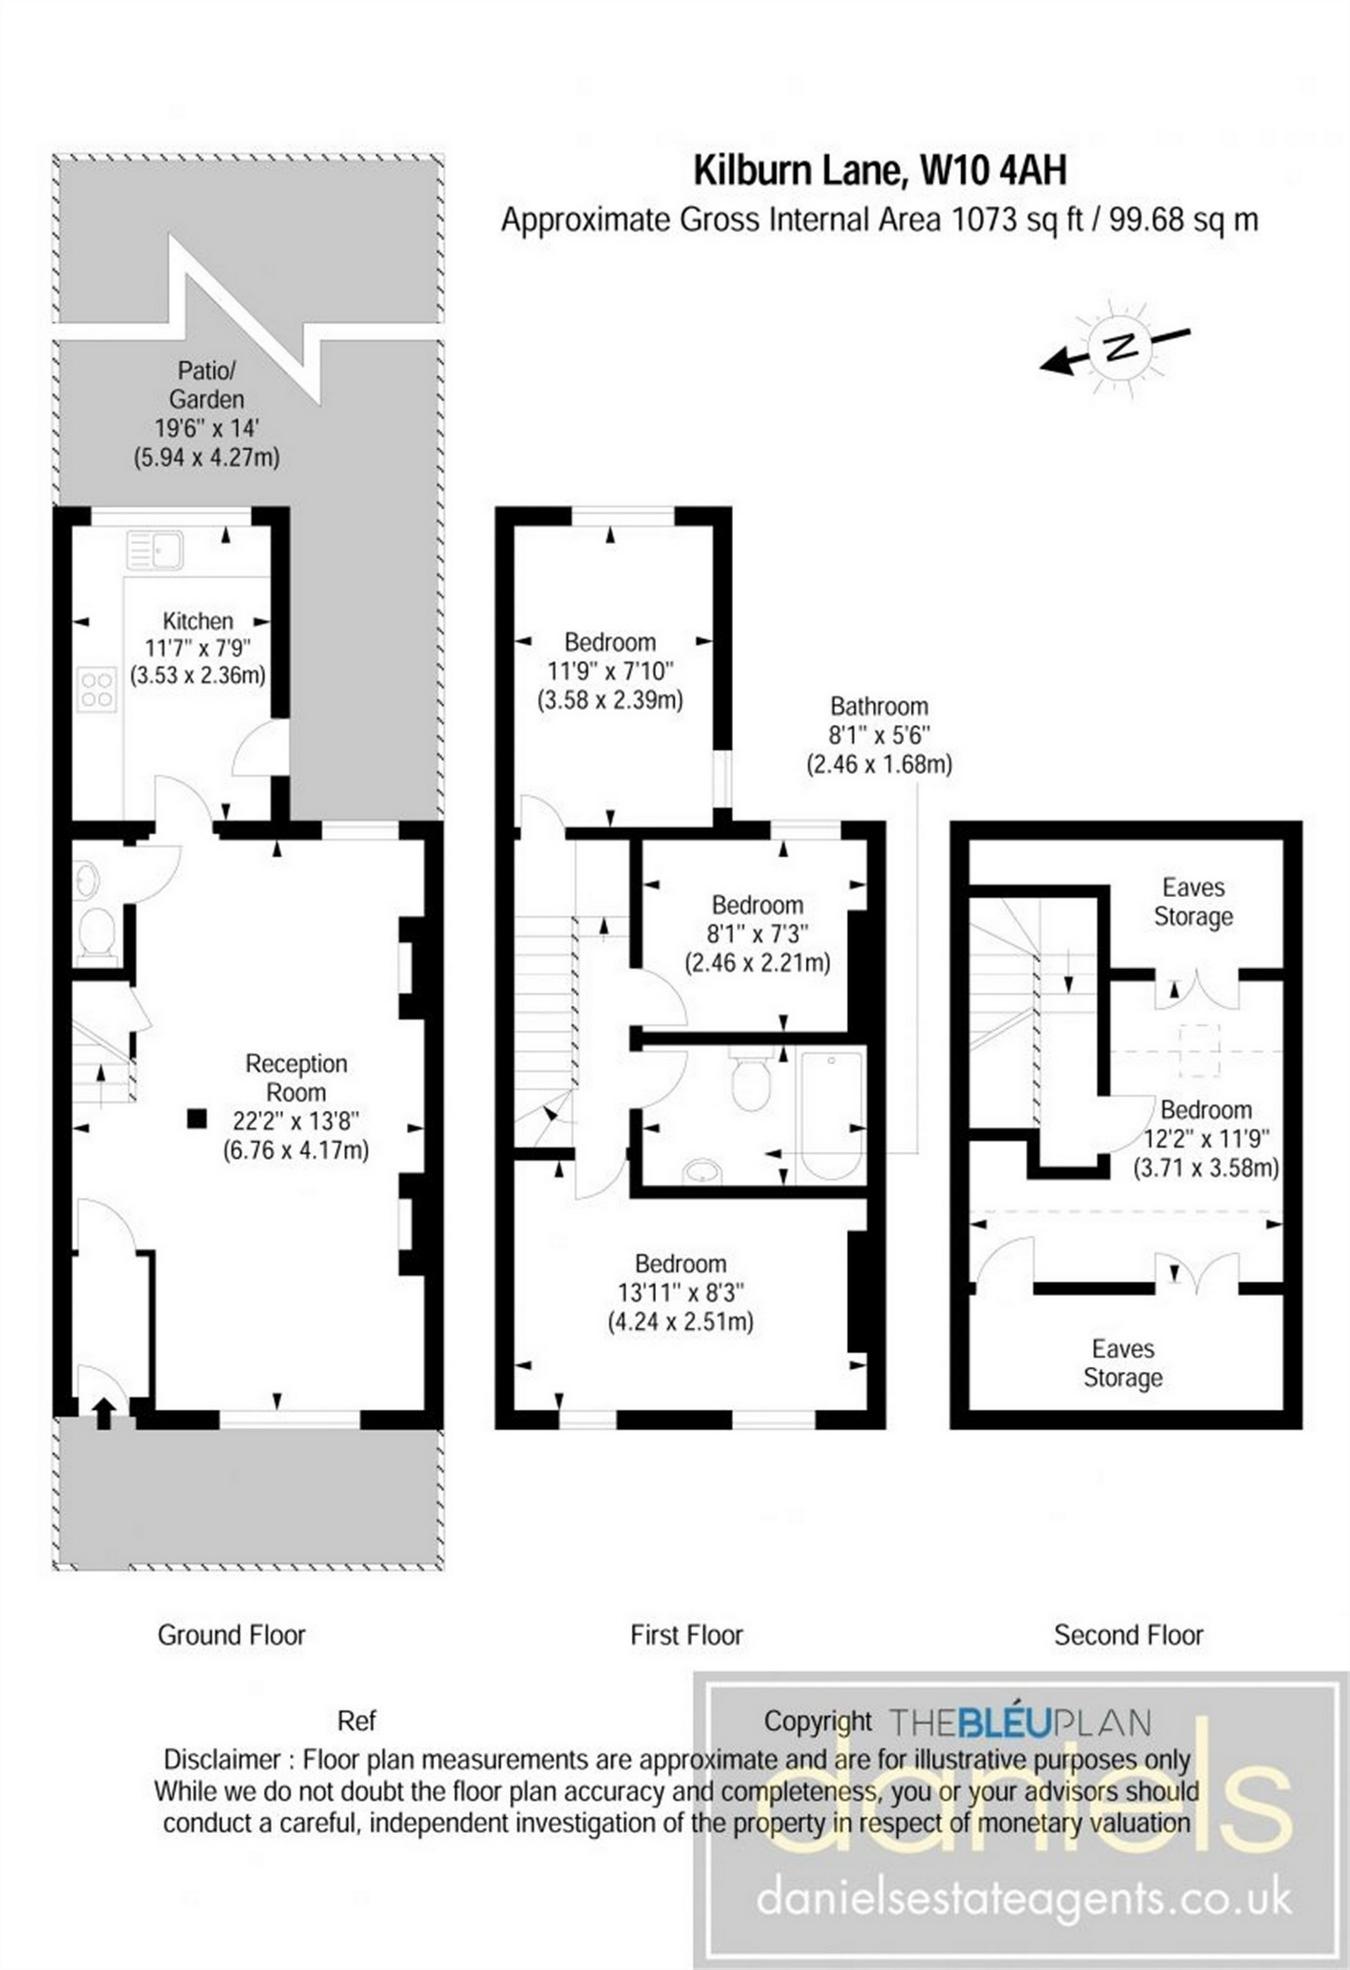 4 Bedrooms Cottage for sale in Kilburn Lane, Queens Park, London W10